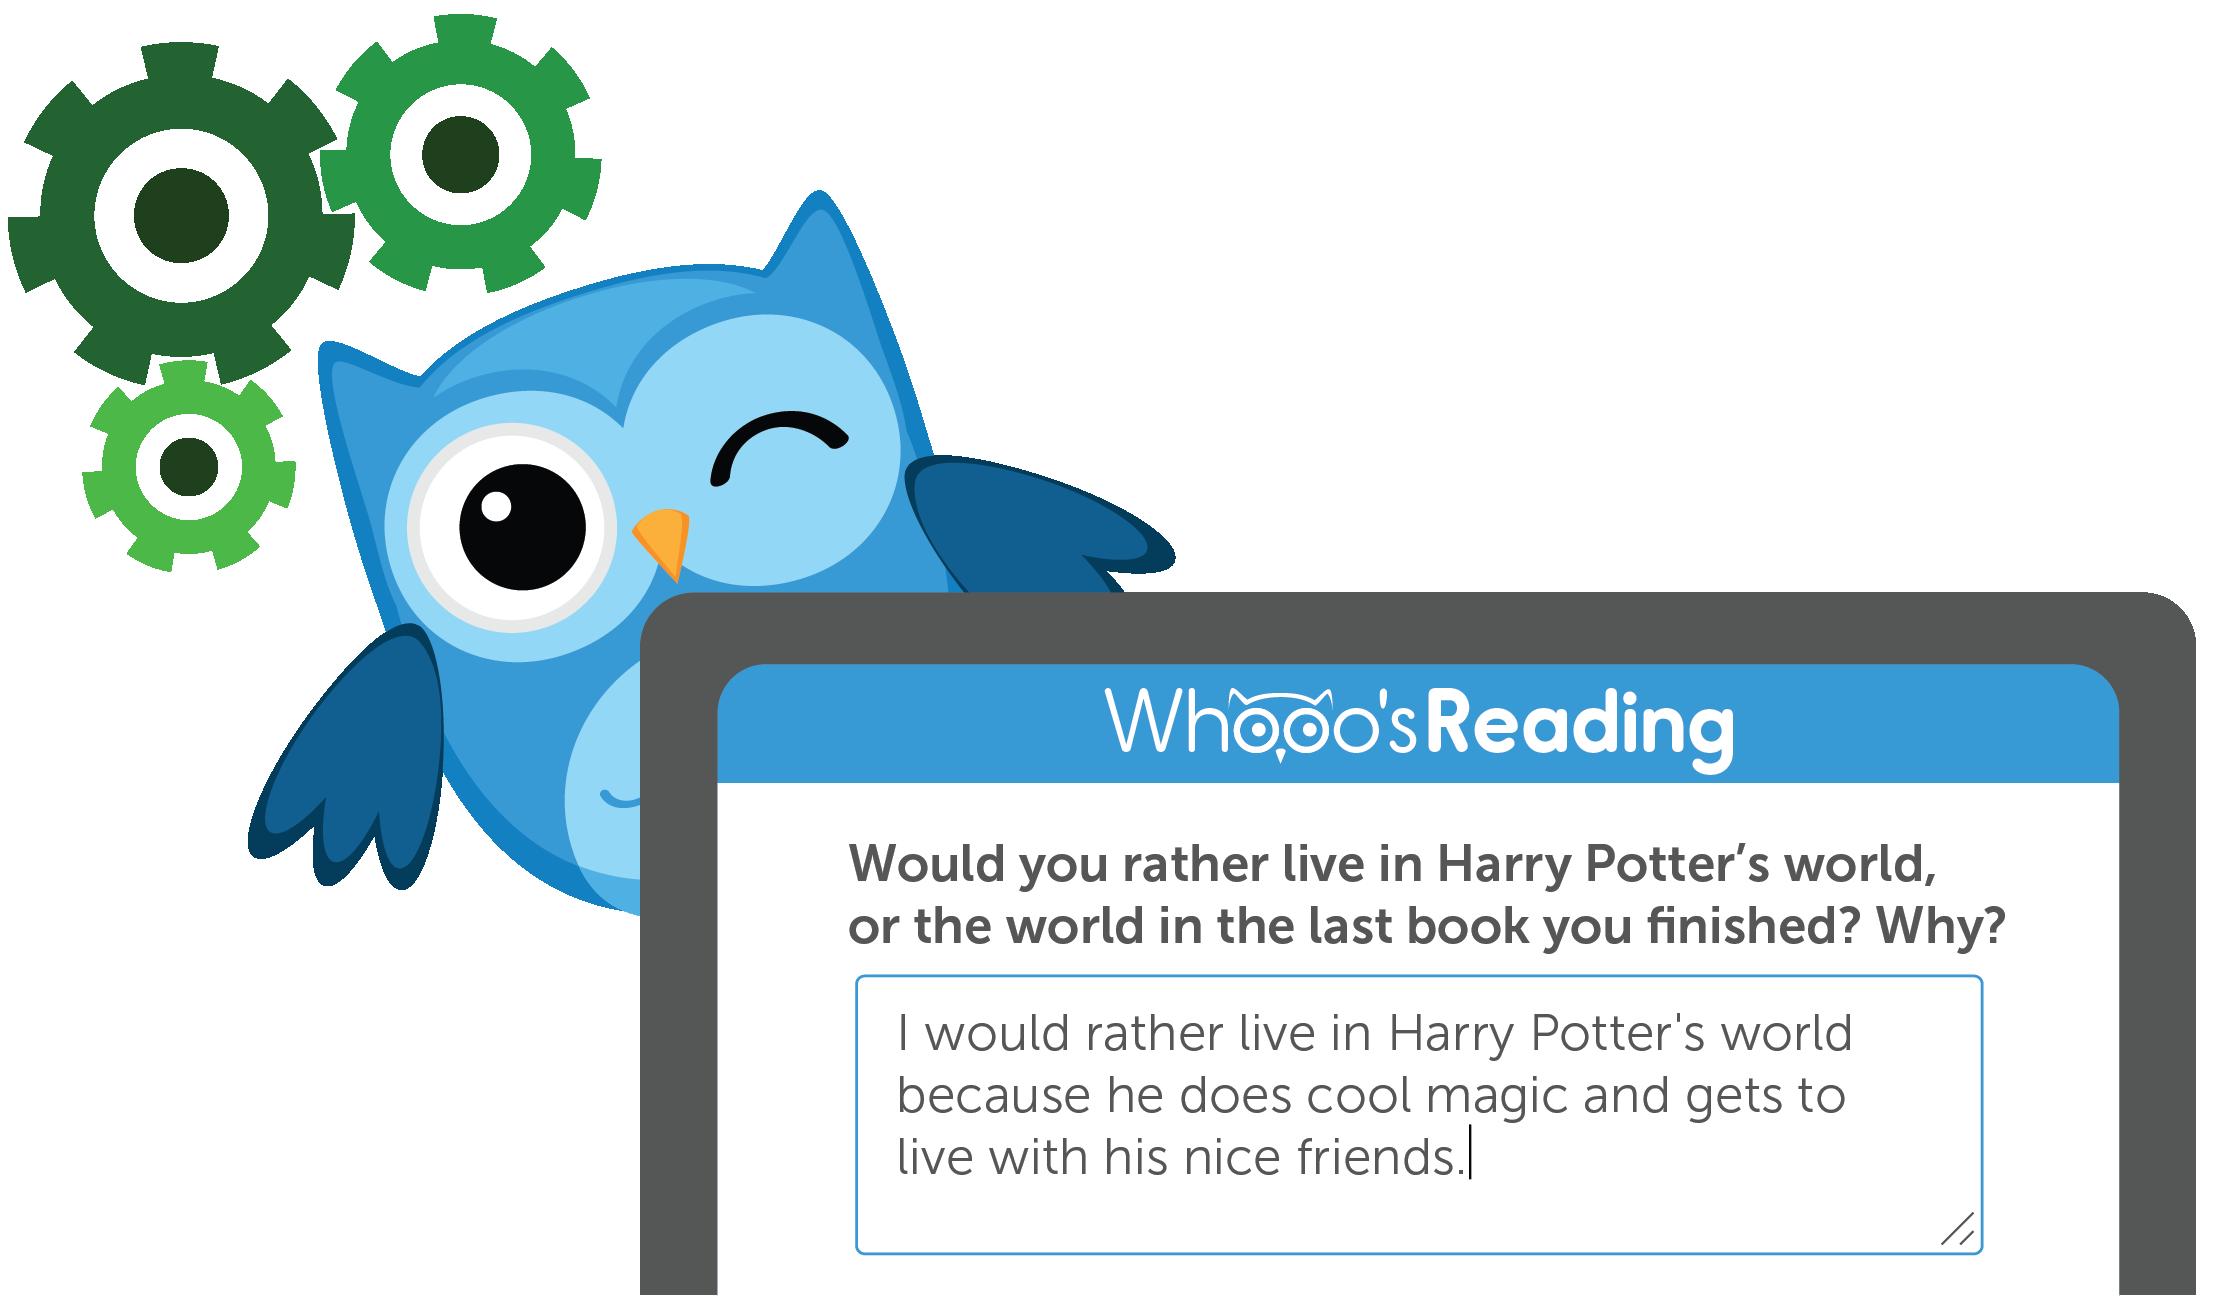 Ảnh: Whooo's Reading